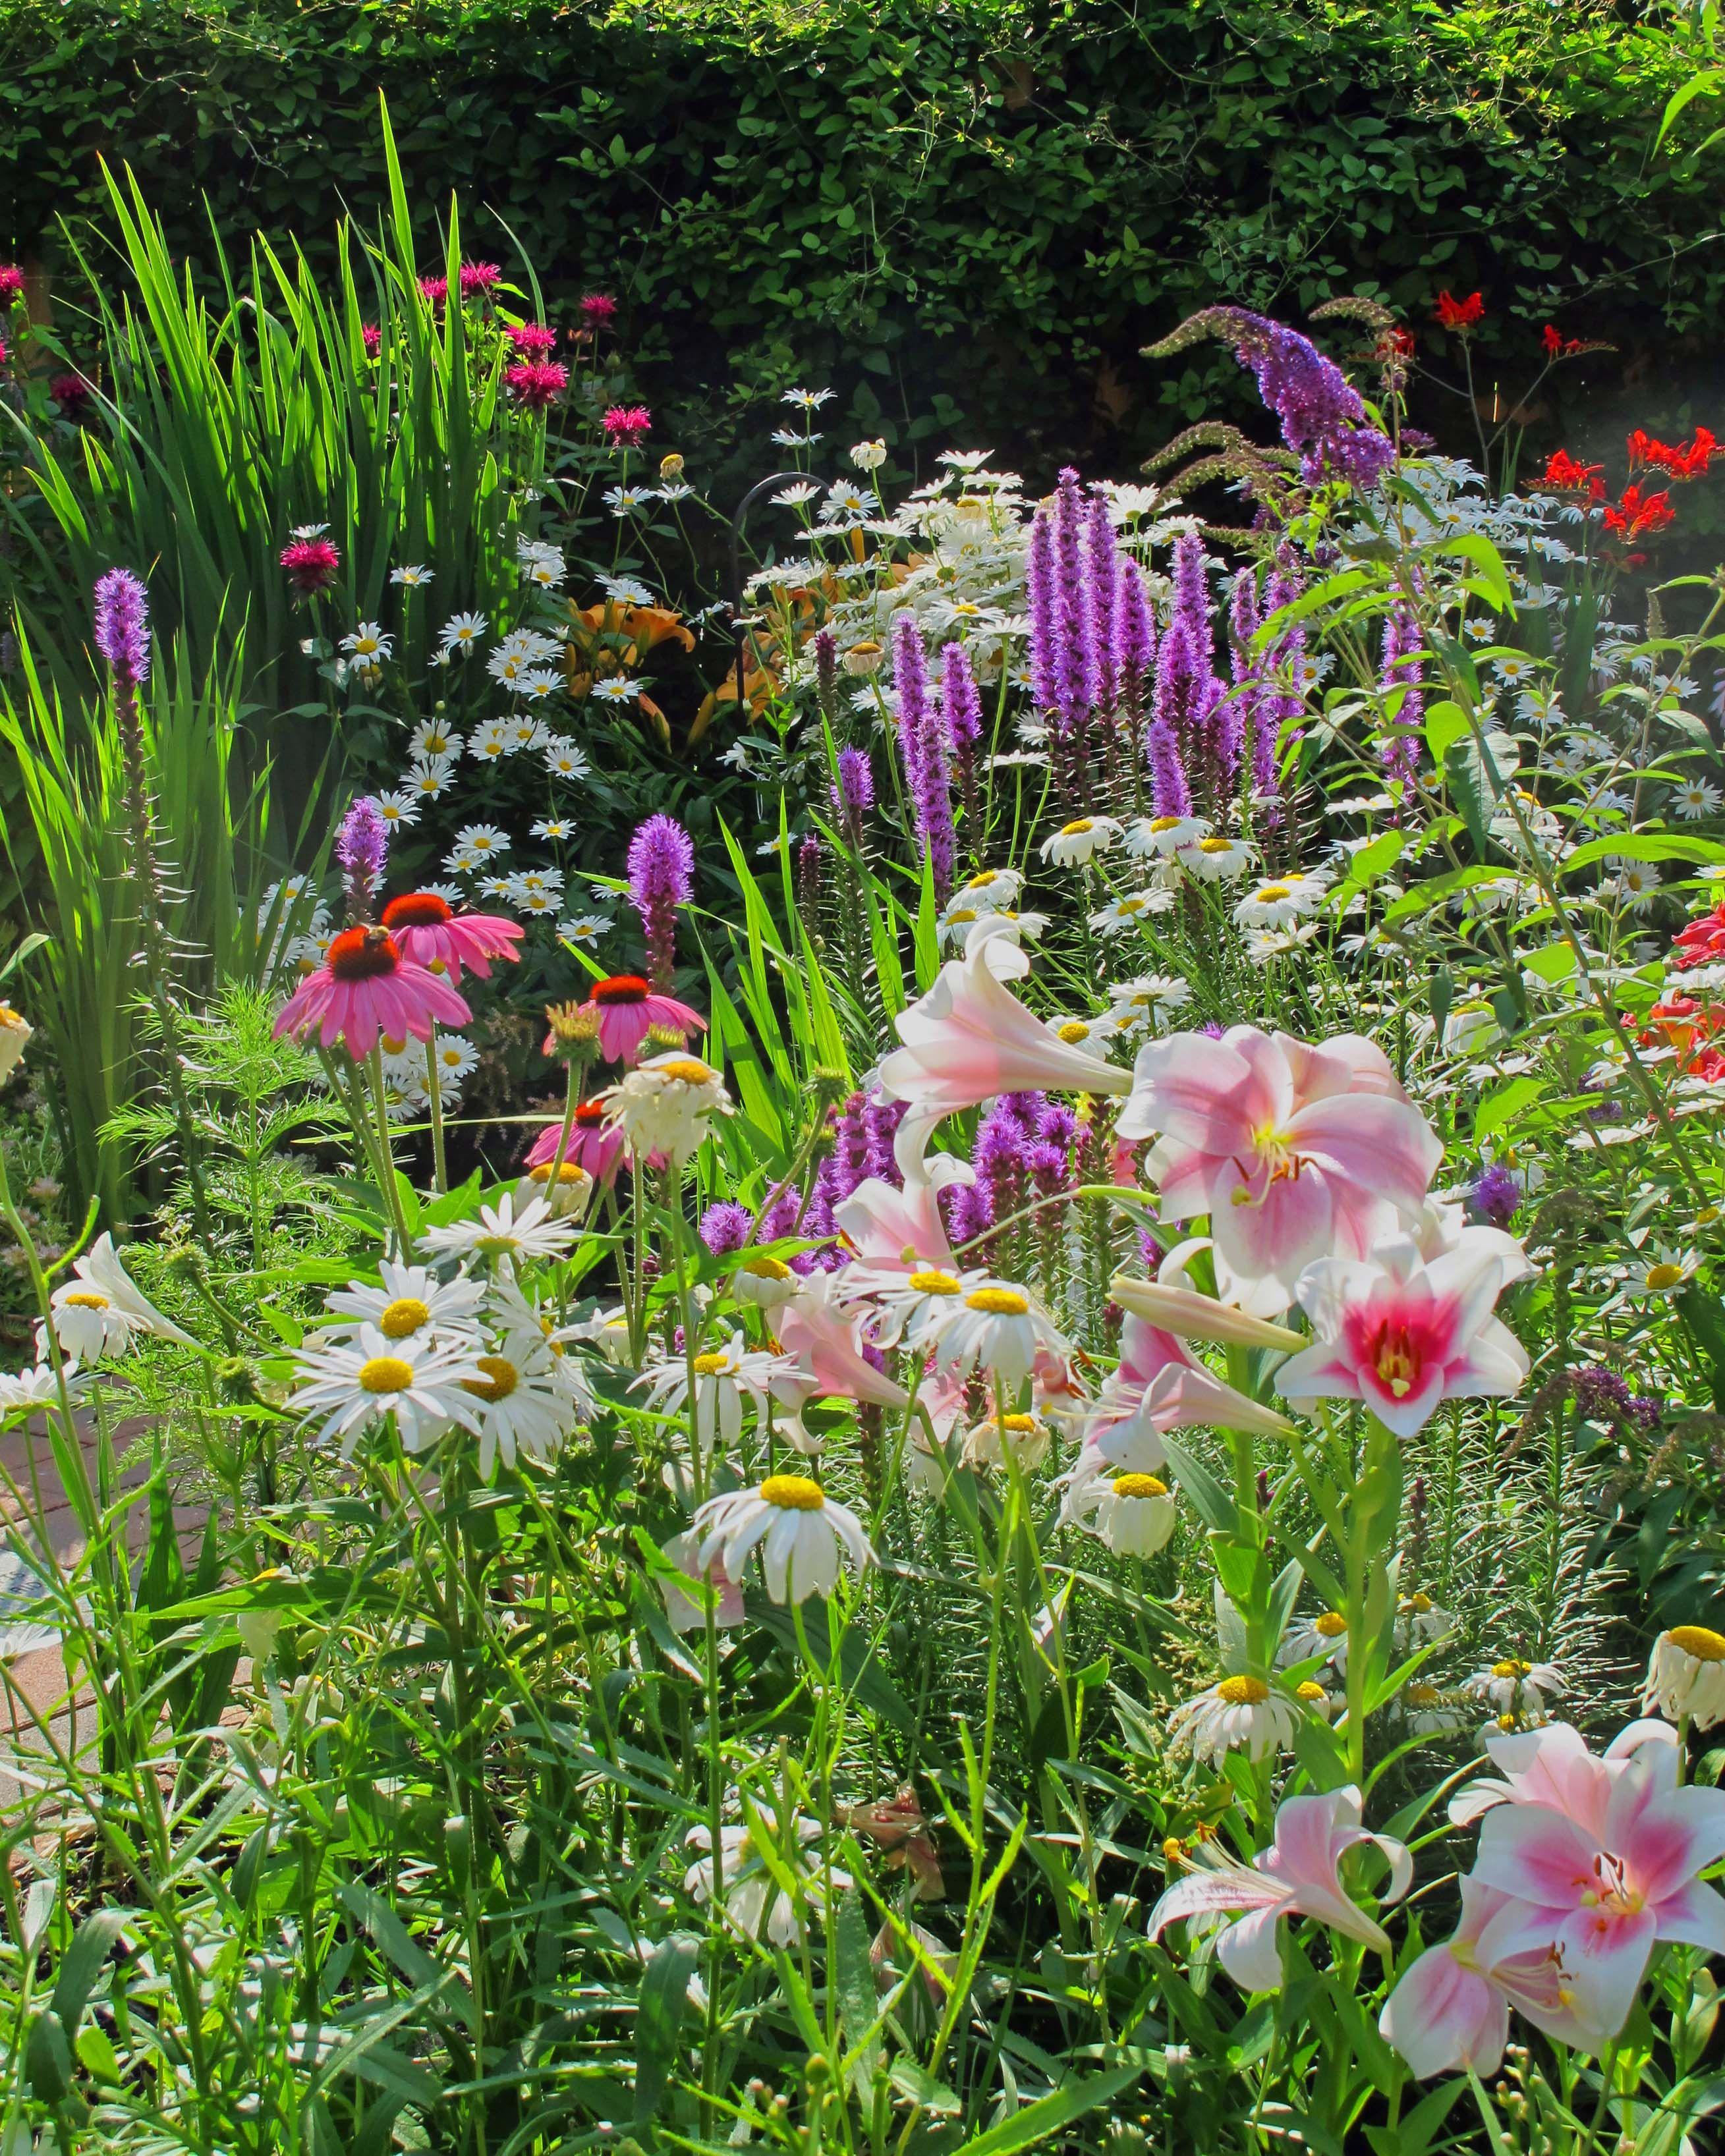 Cottage garden flowers Daisies Liatris Lilies Crocosmia